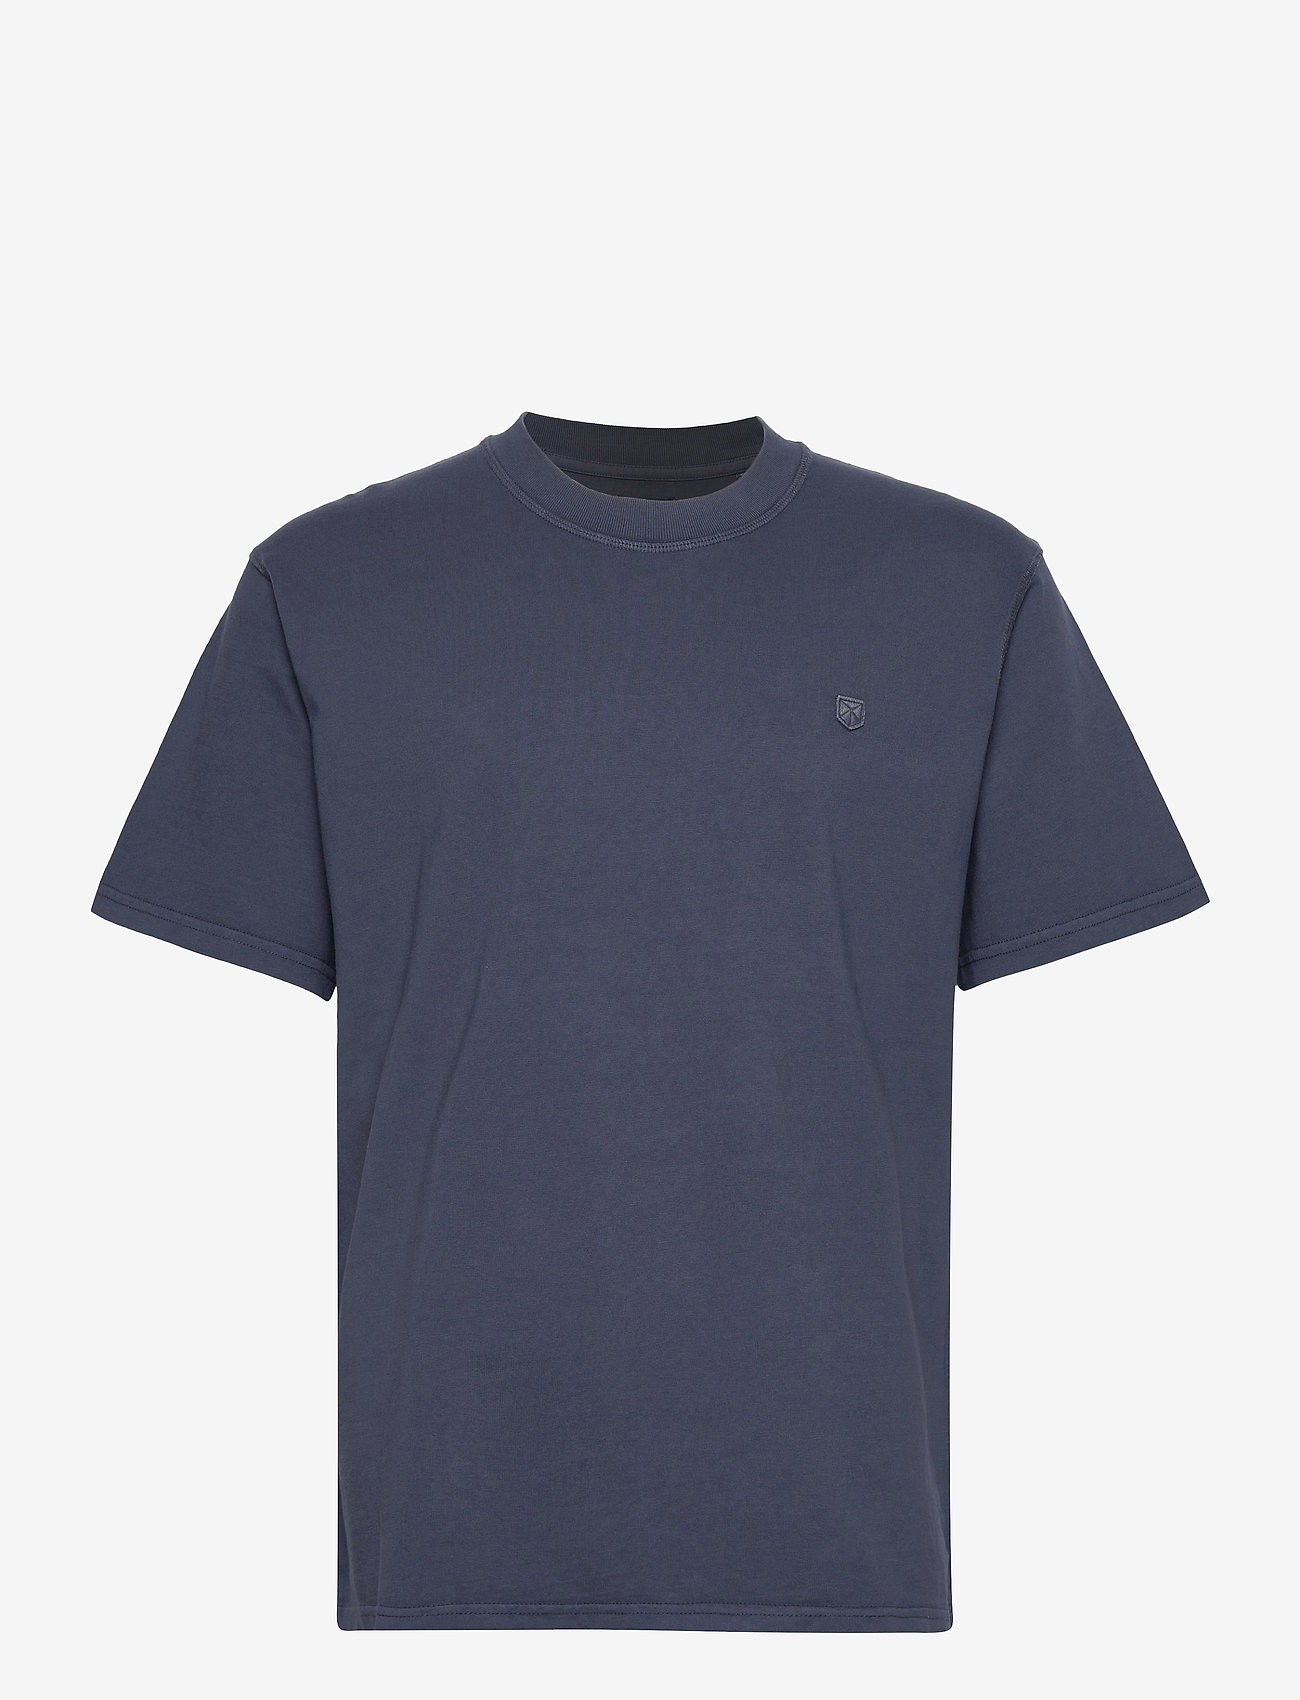 Jack & Jones - JPRBLUJULIO TEE SS CREW NECK - basic t-shirts - peacoat - 0